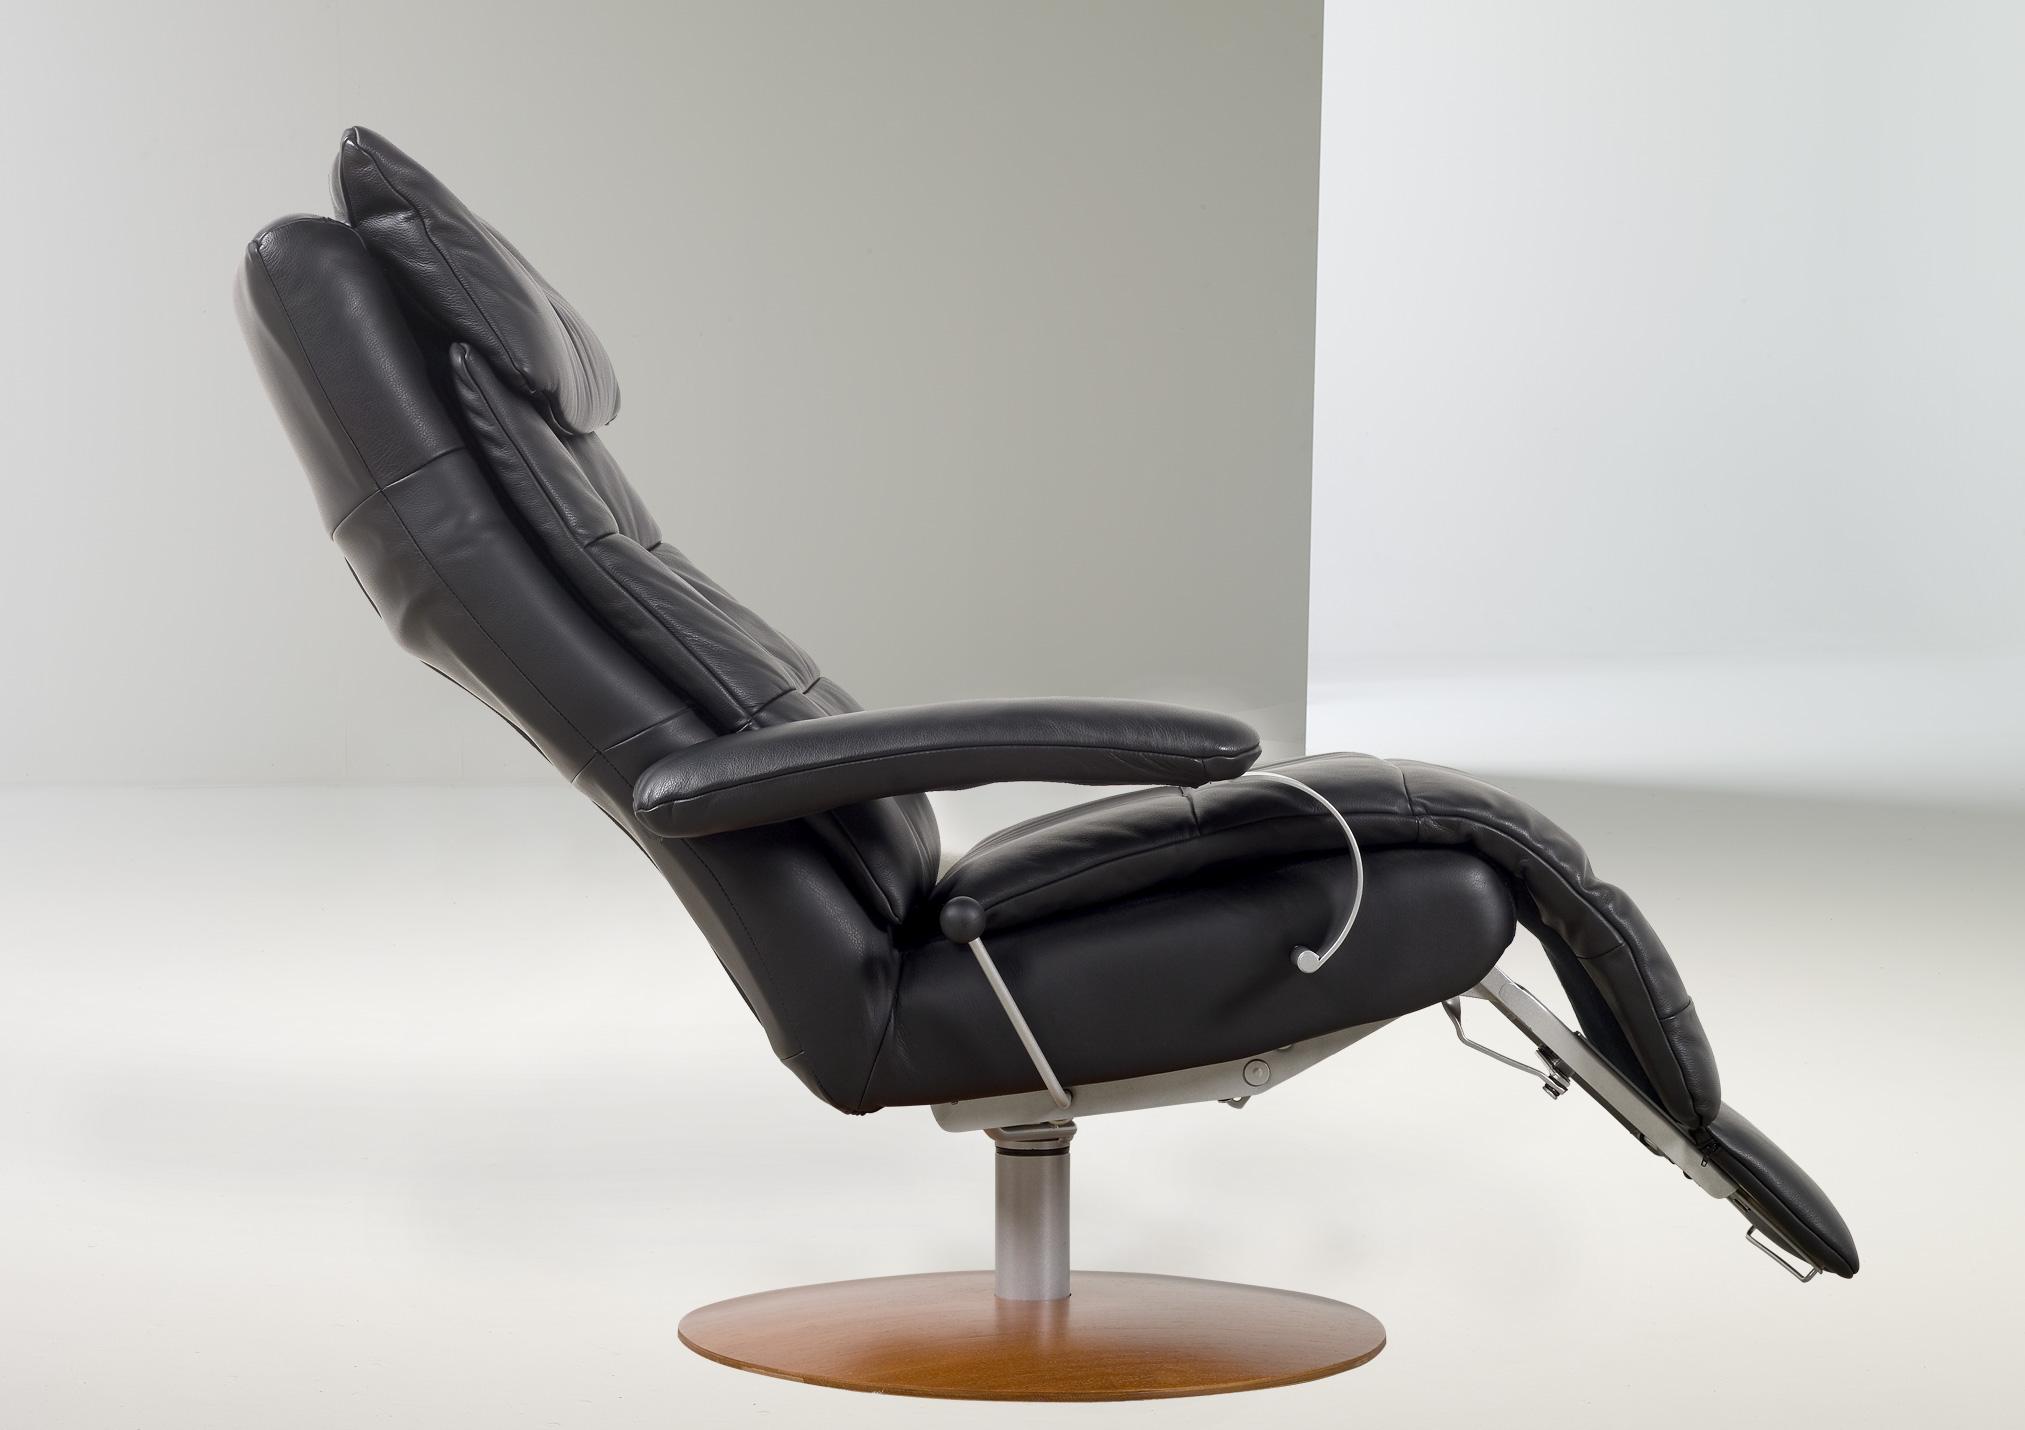 Butaca reclinable y acogedora